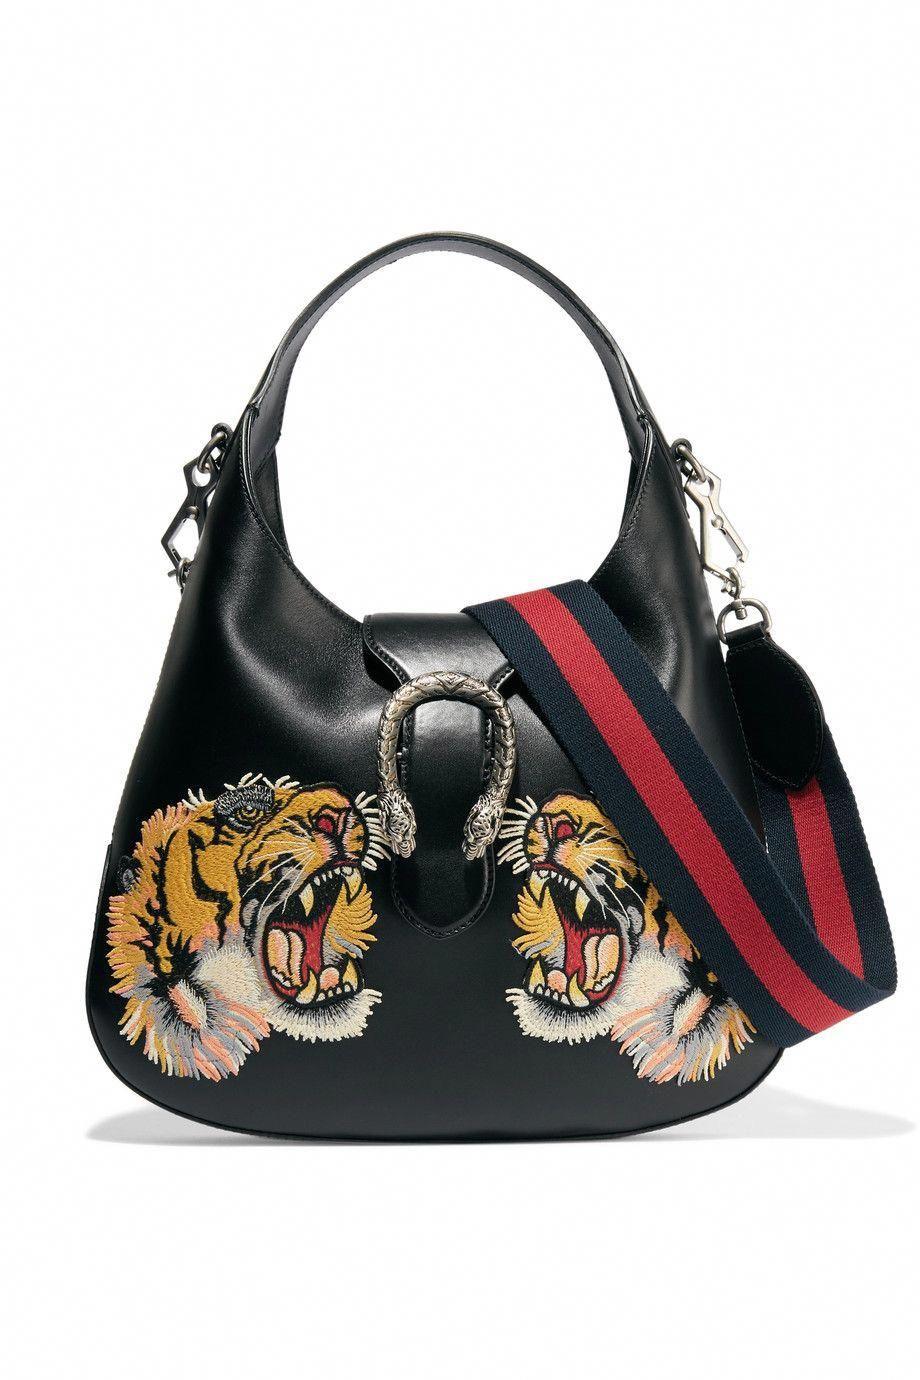 14291a857951 Gucci | Dionysus Hobo small appliquéd leather shoulder bag | NET-A-PORTER.